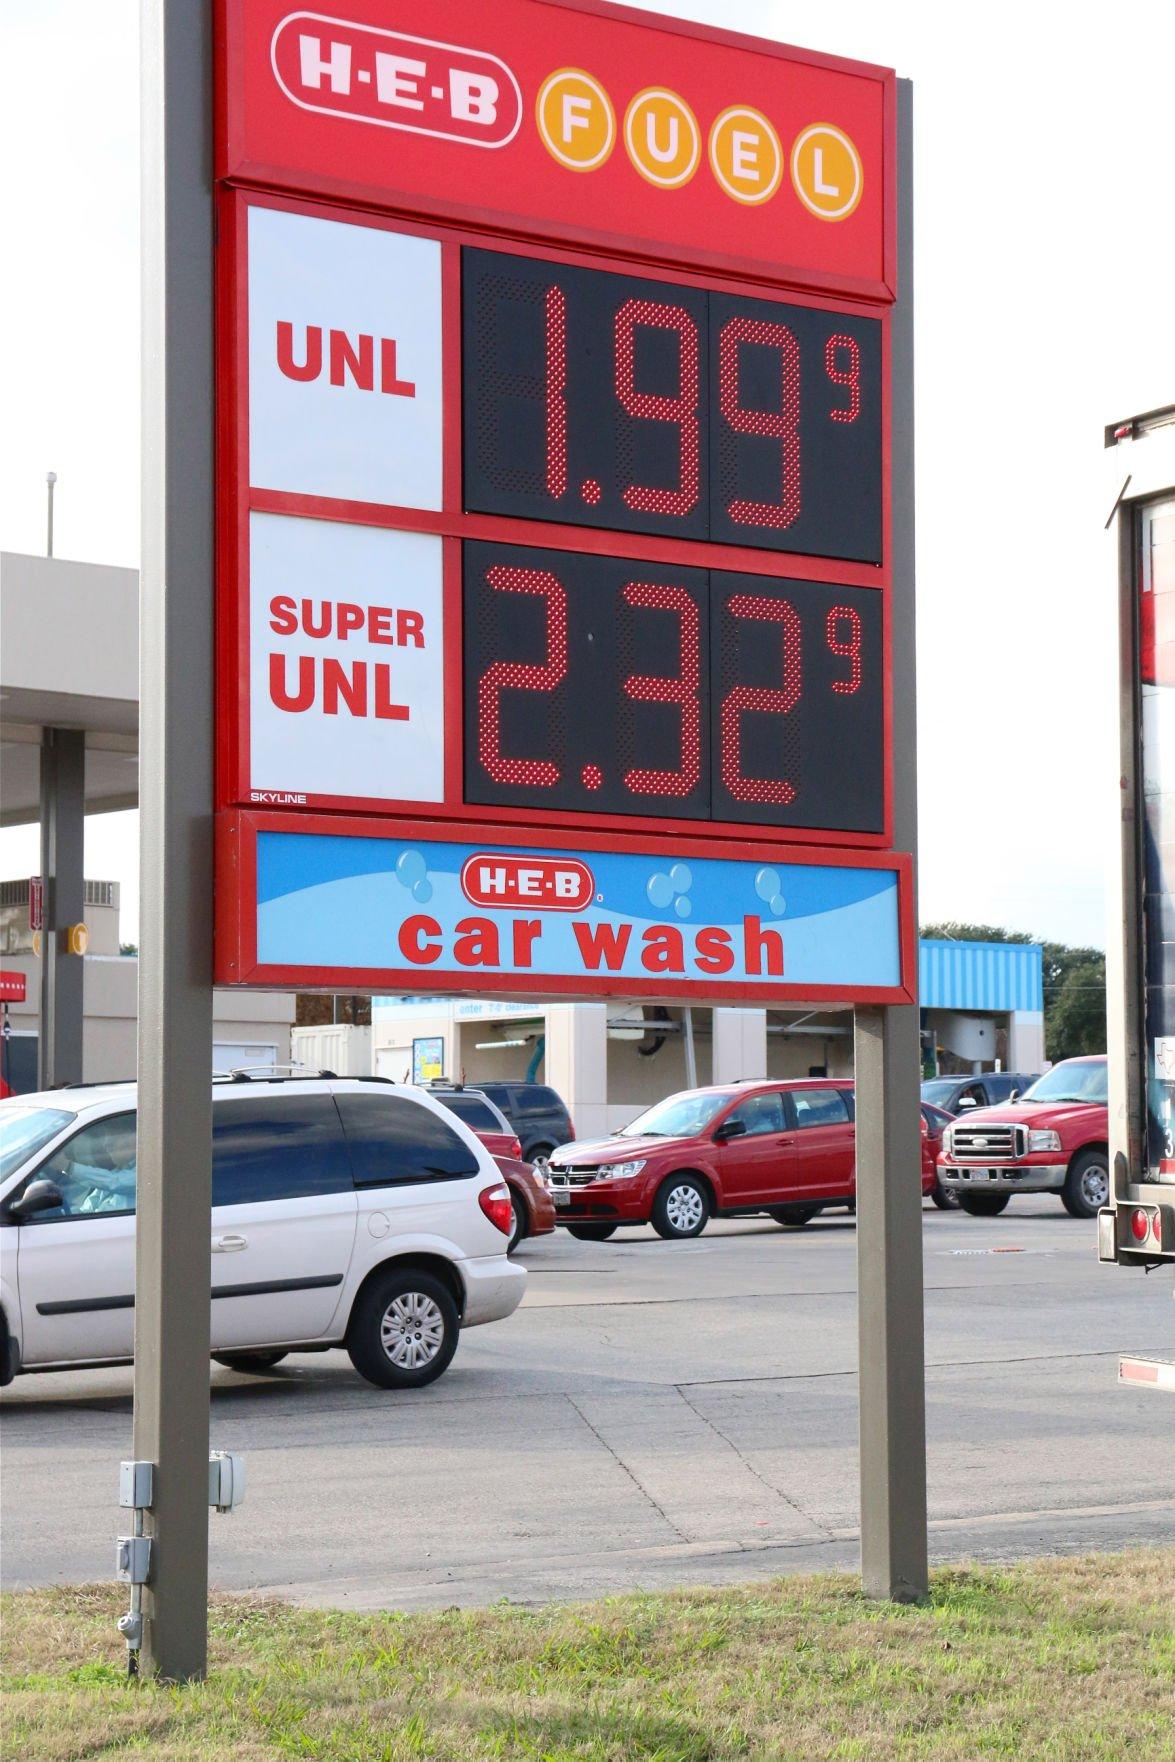 Cheap gas a mixed blessing for texas texas kdhnews cheap gas a mixed blessing for texas solutioingenieria Choice Image